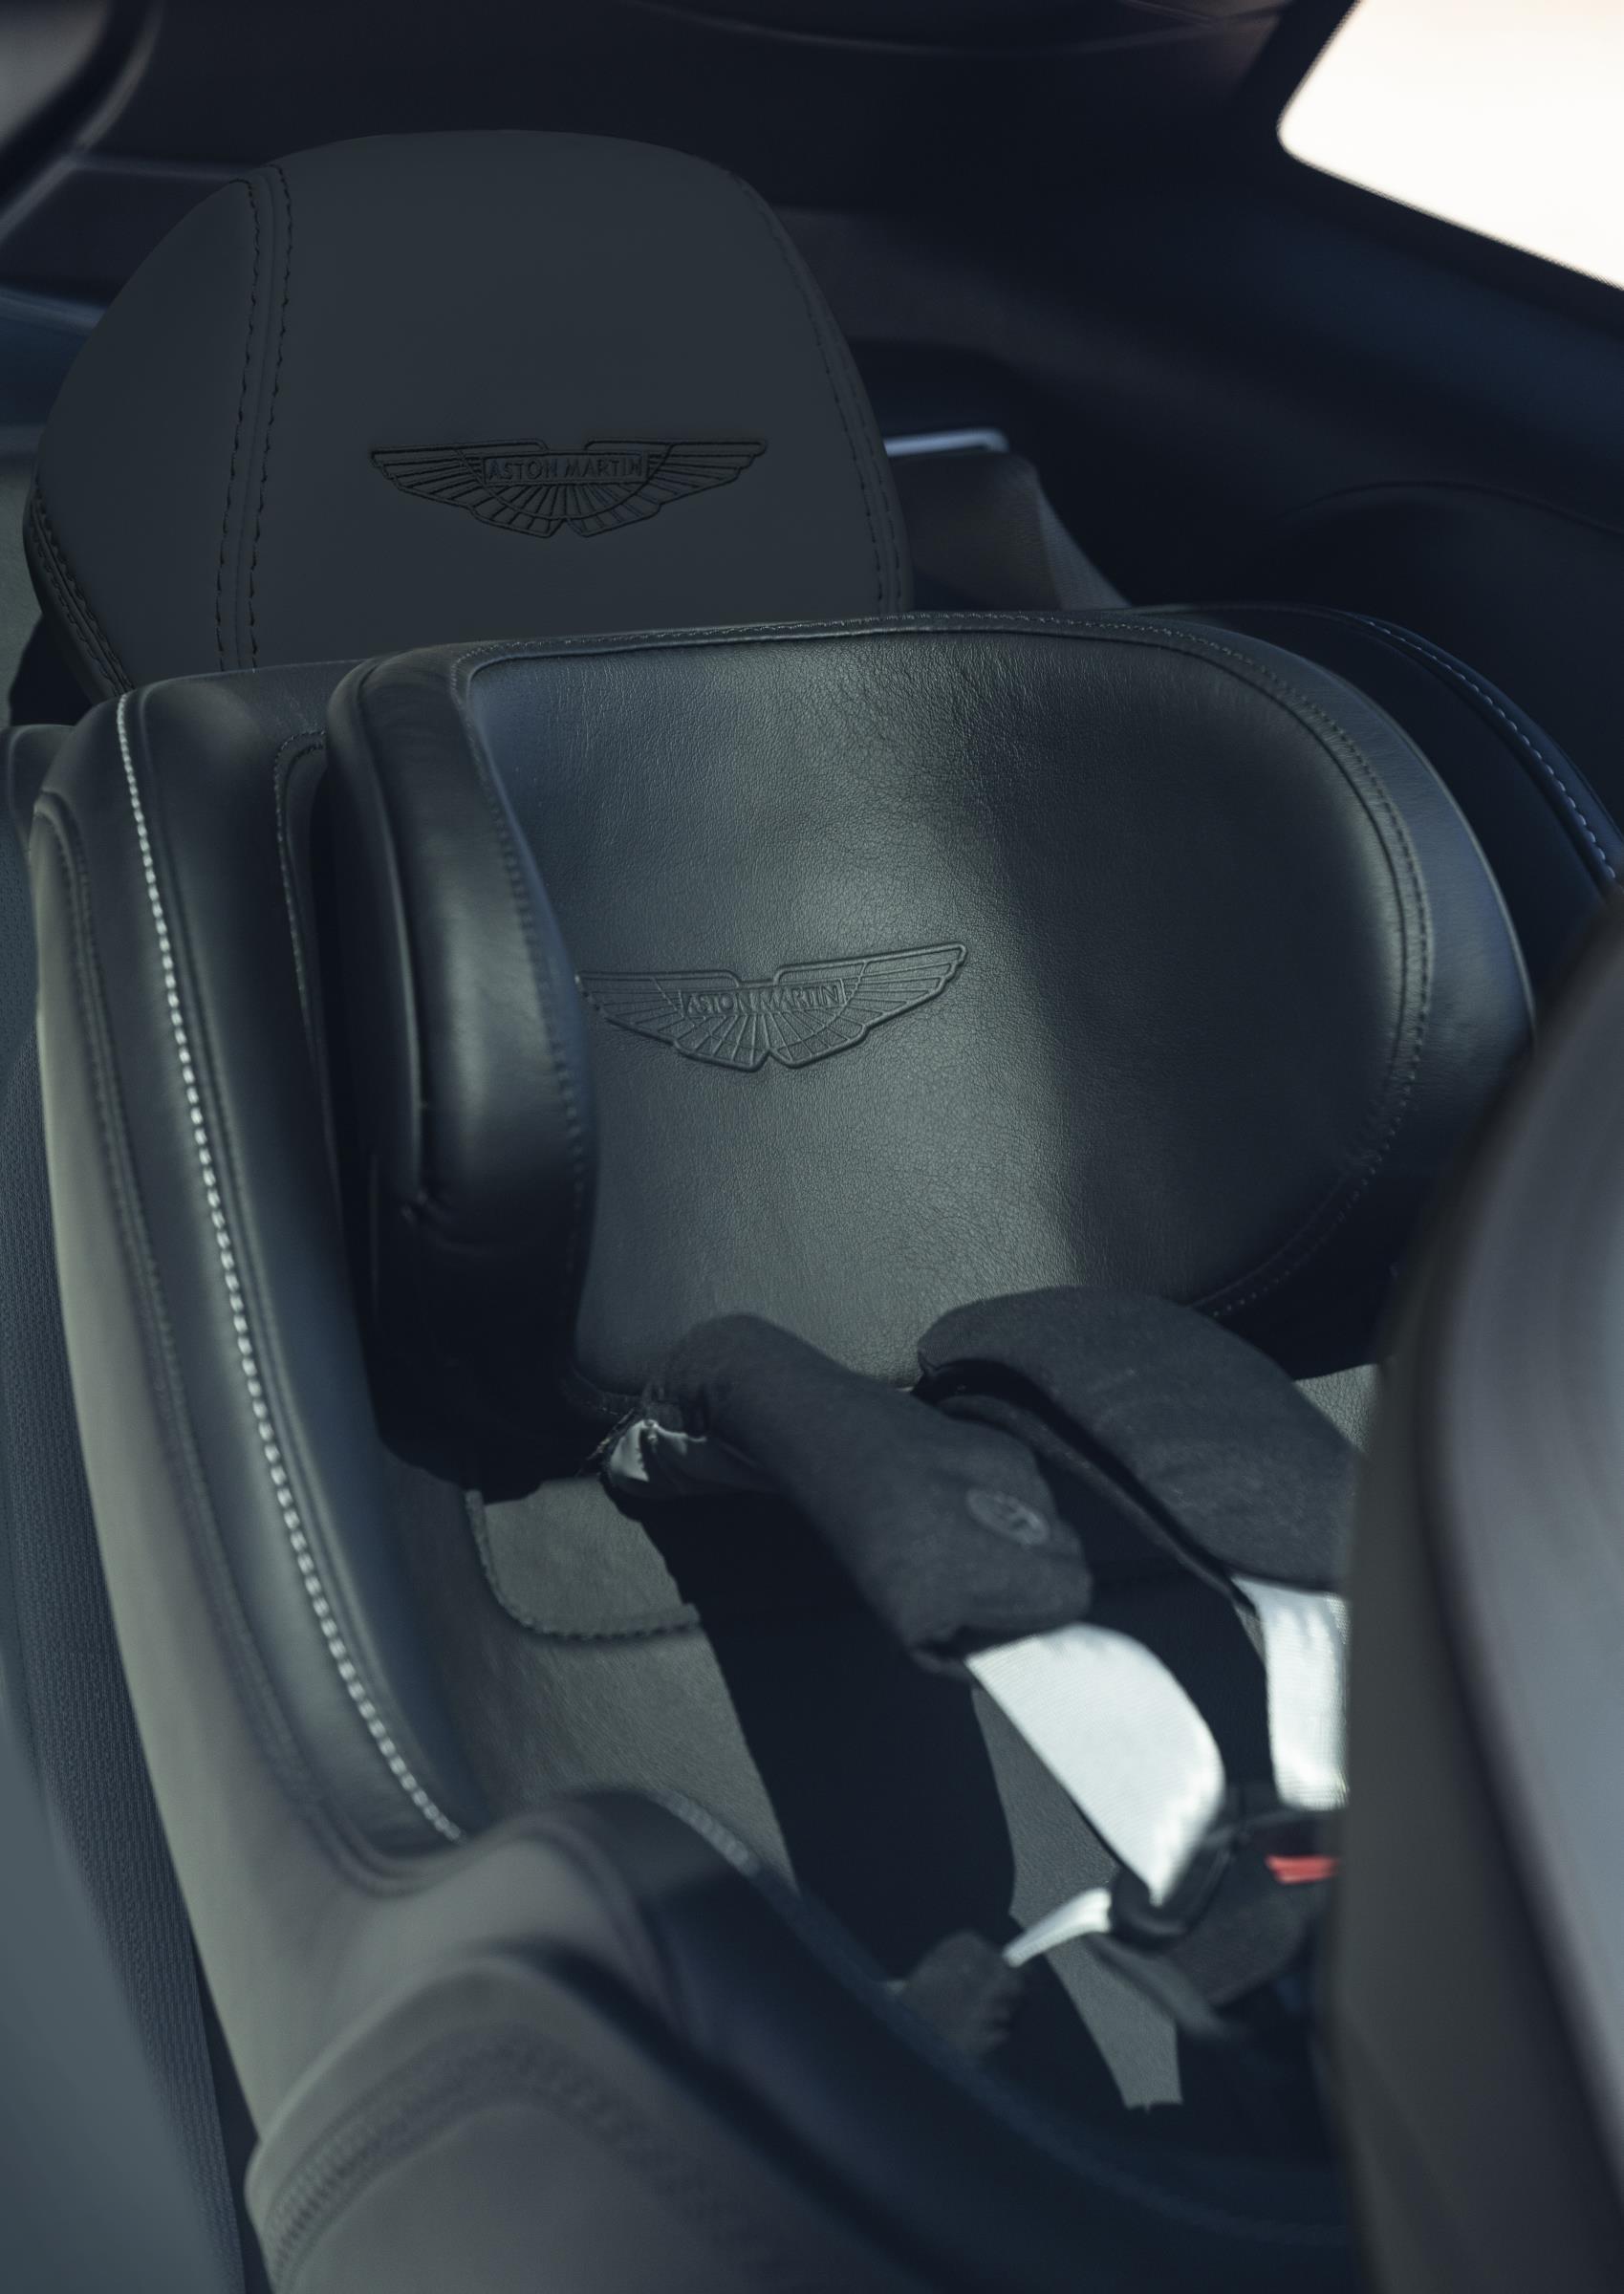 Aston Martin DBX Child Seat